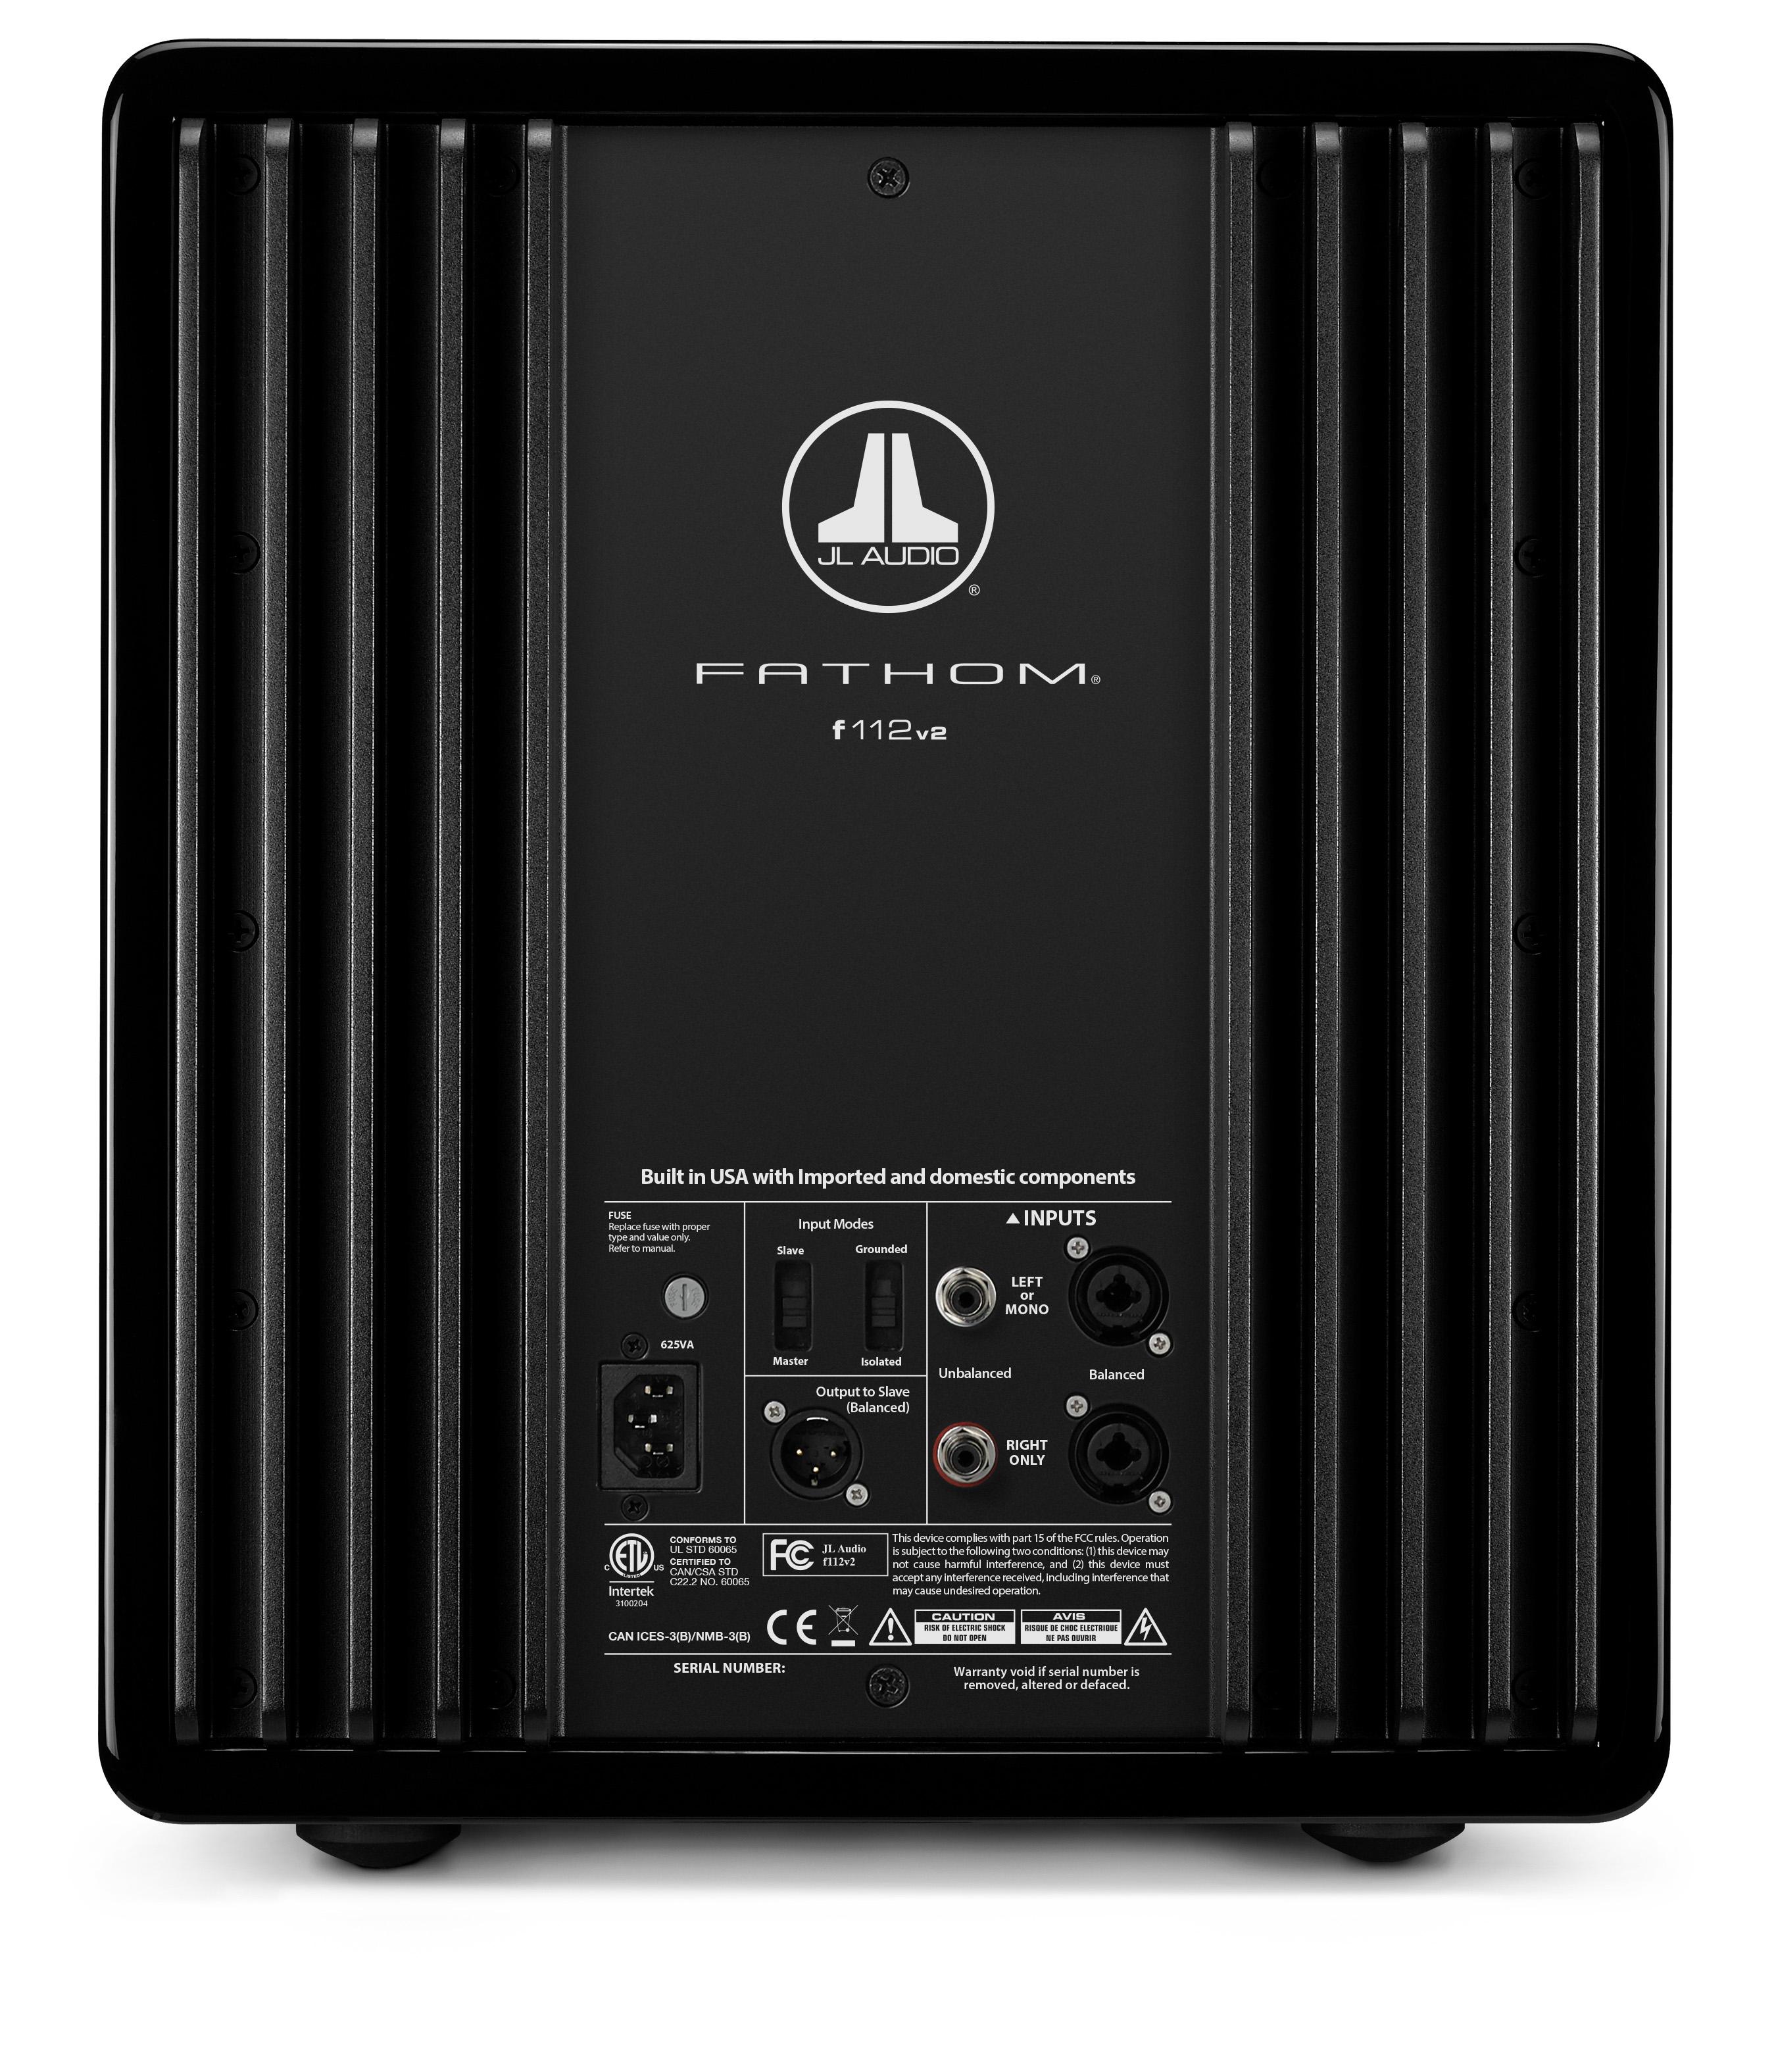 JL Audio Fathom F112 V2 | Ideal AV Home Cinema